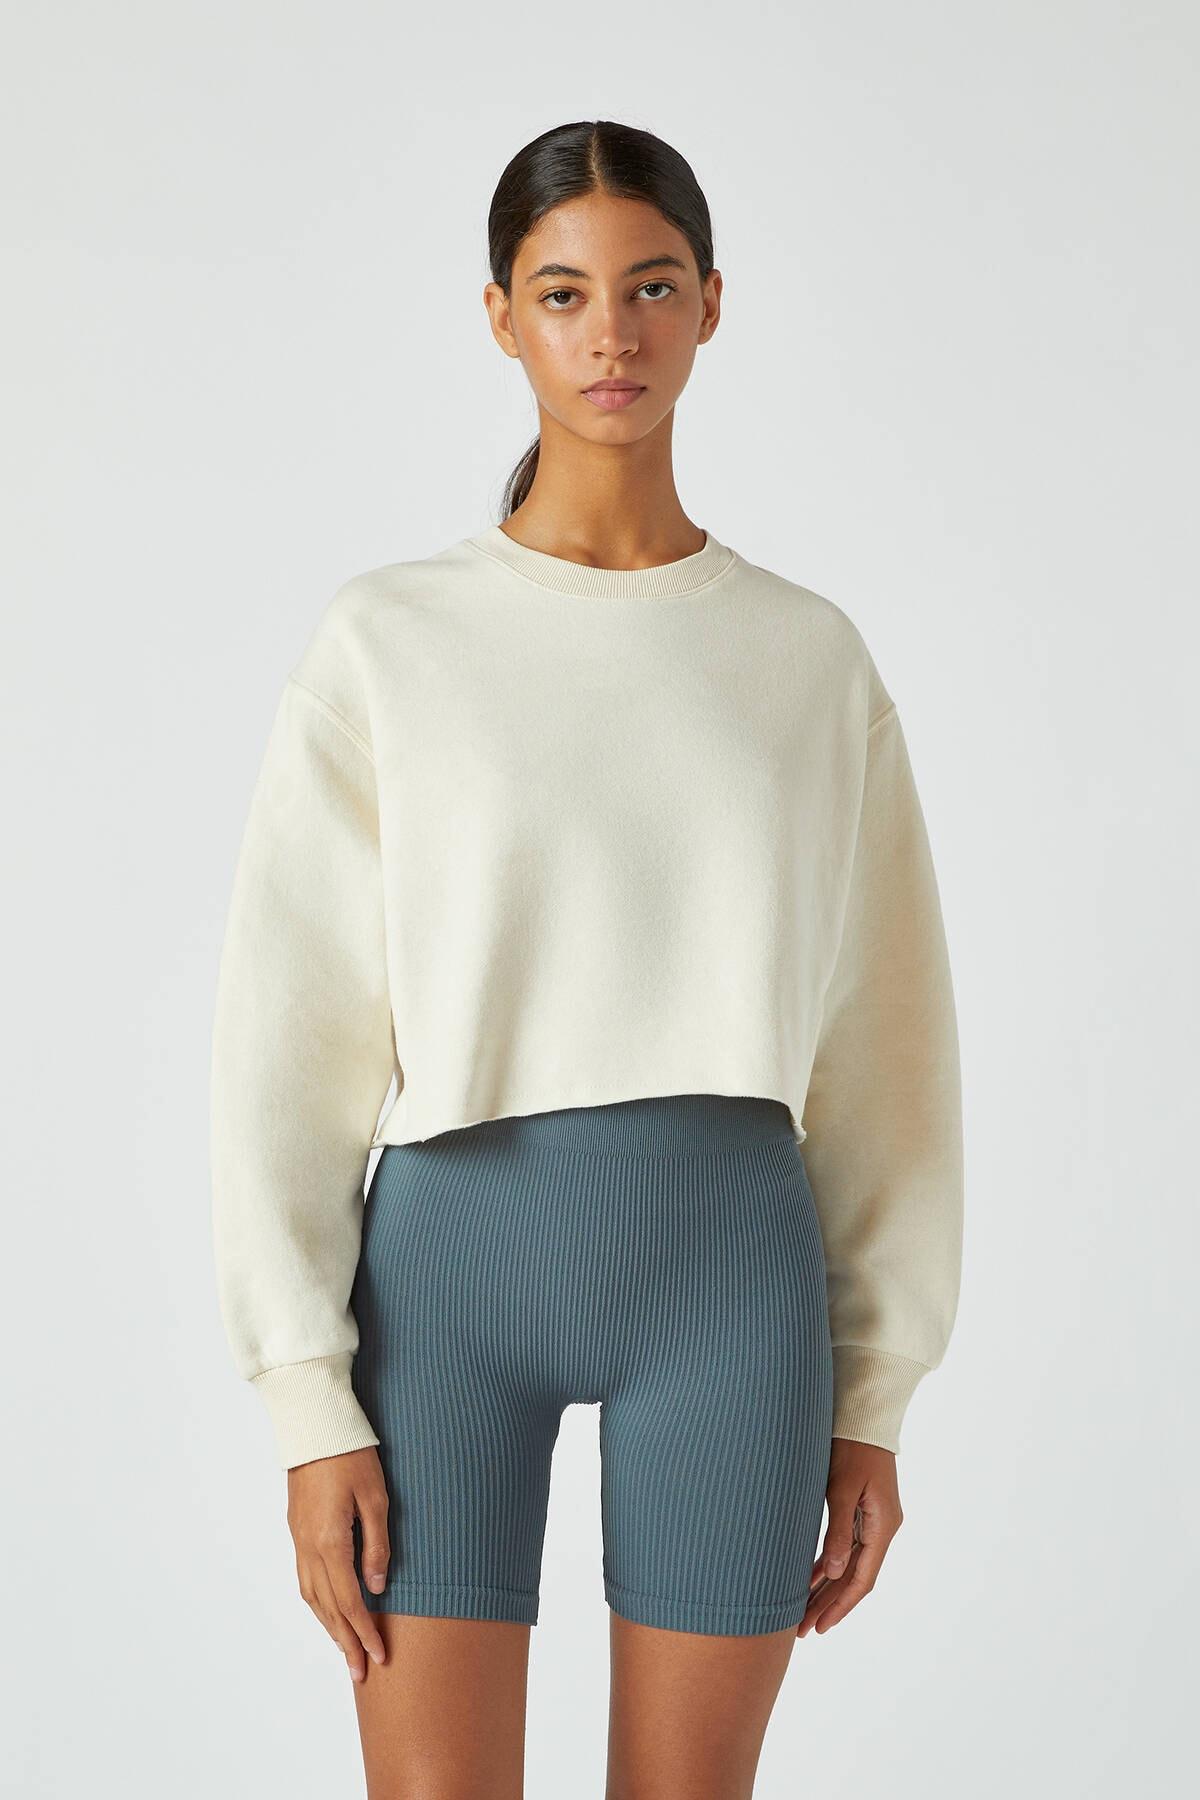 Pull & Bear Kadın Buz Rengi Rahat Crop Fit Sweatshirt 09594315 0